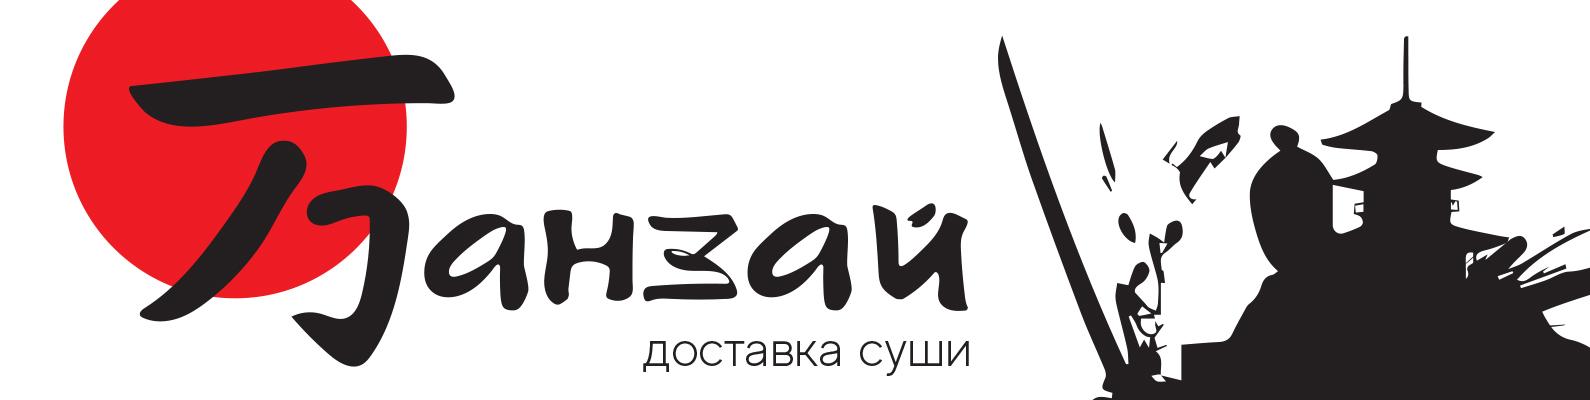 Доставка суши Банзай г.Назарово